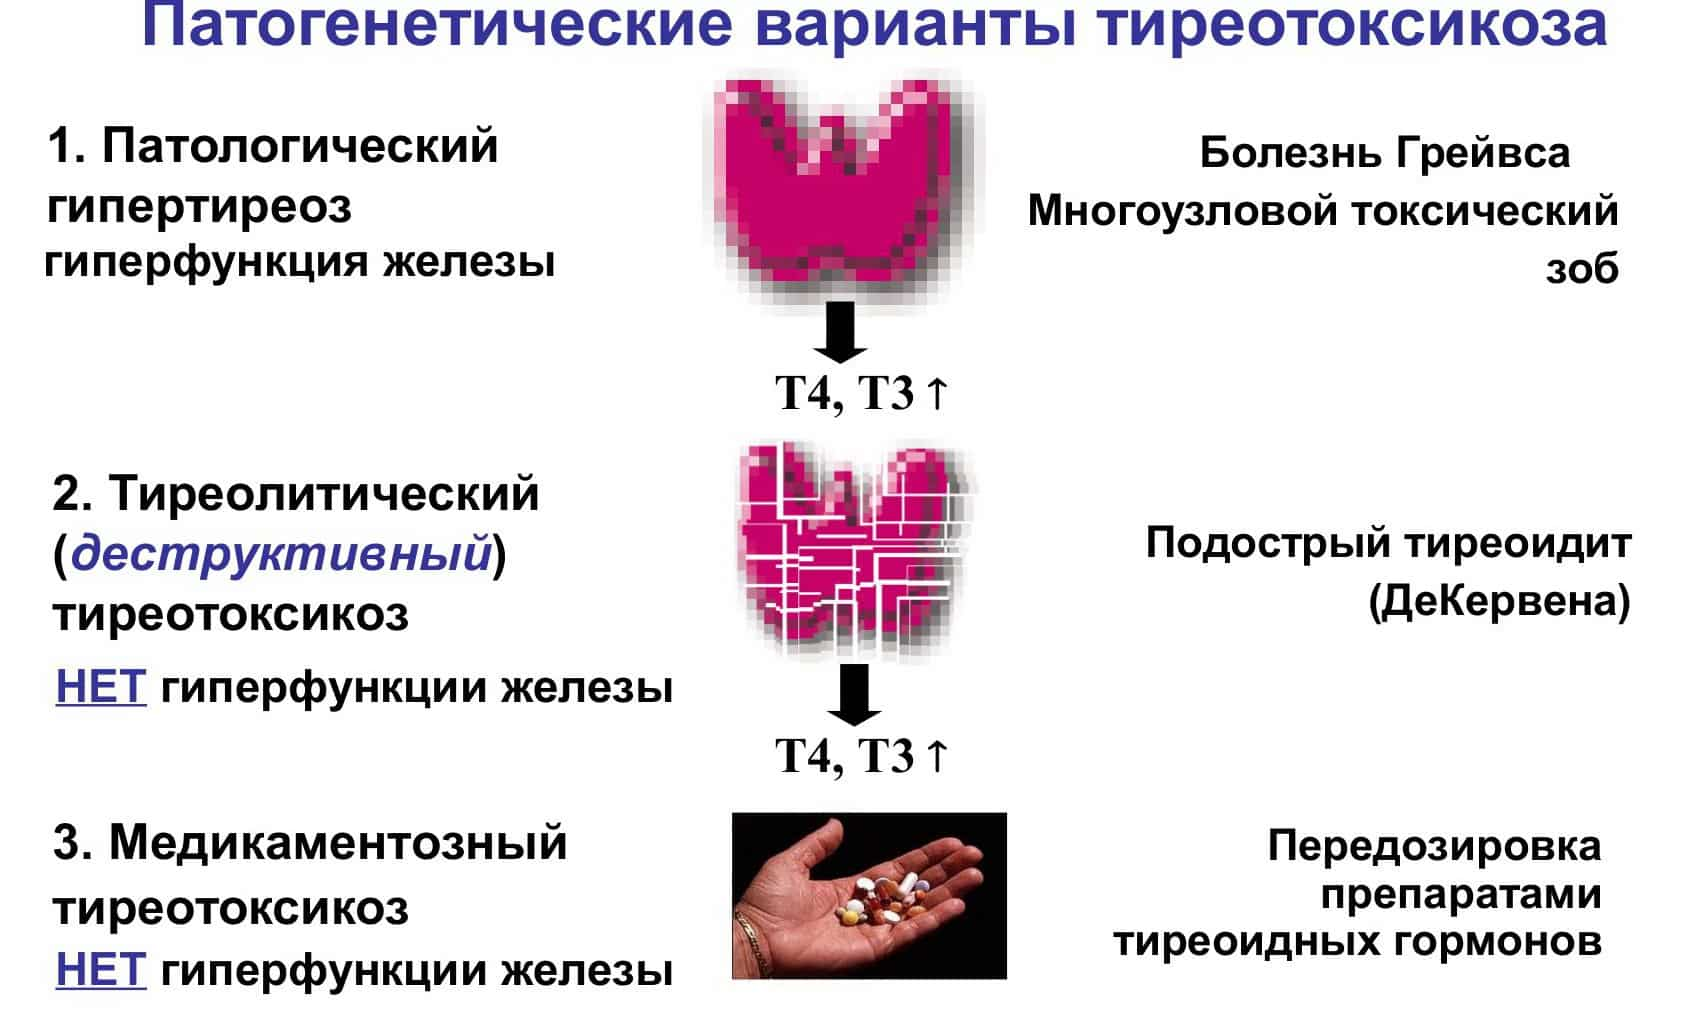 профилактика от паразитов у человека